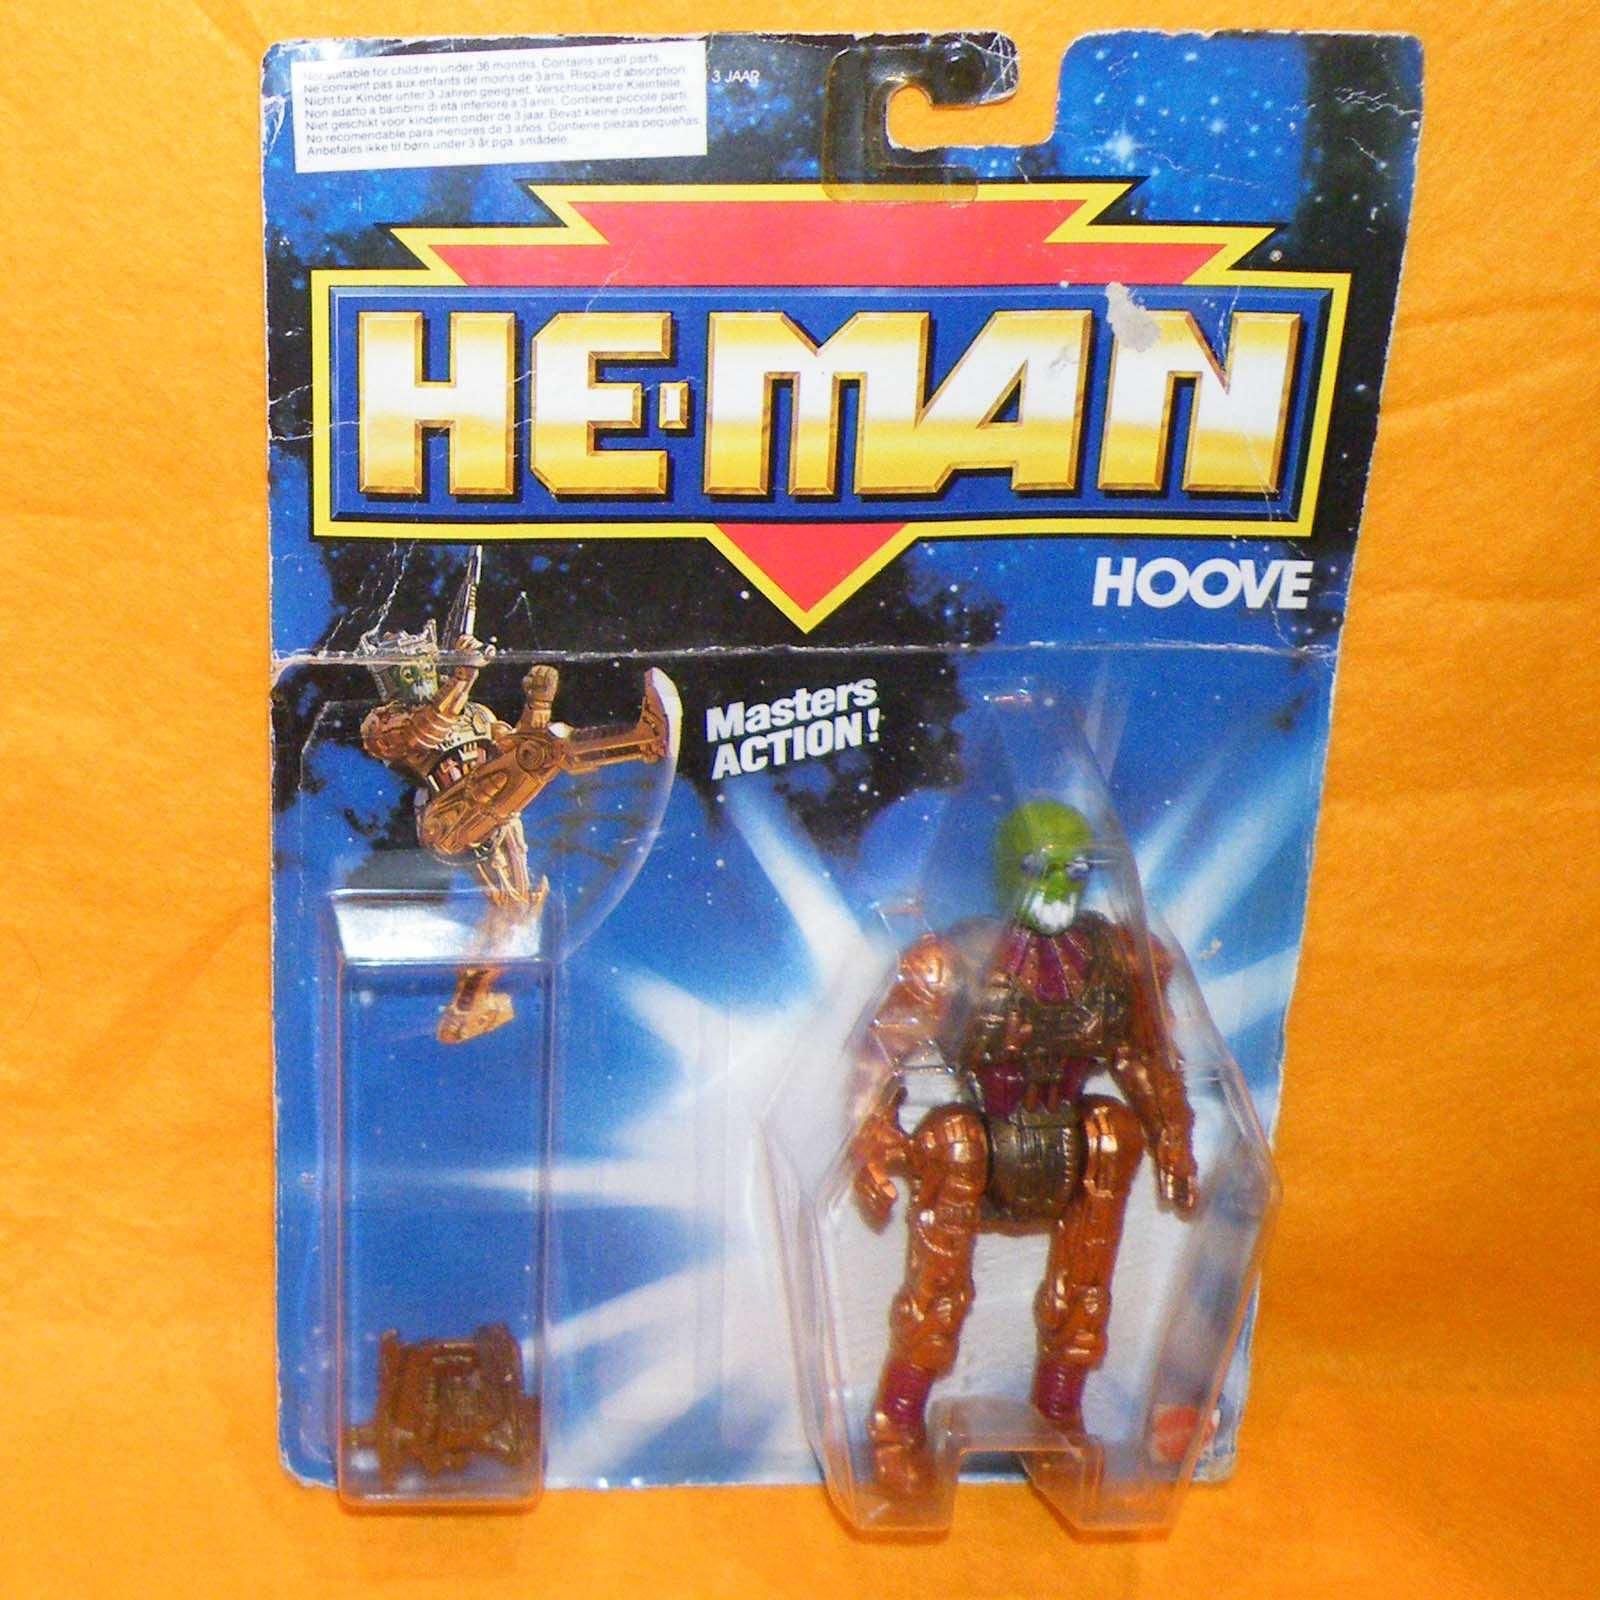 VINTAGE 1990 90s MATTEL MOTU NUOVE AVVENTURE DI HE-MAN Hoove figura MOC Cardato